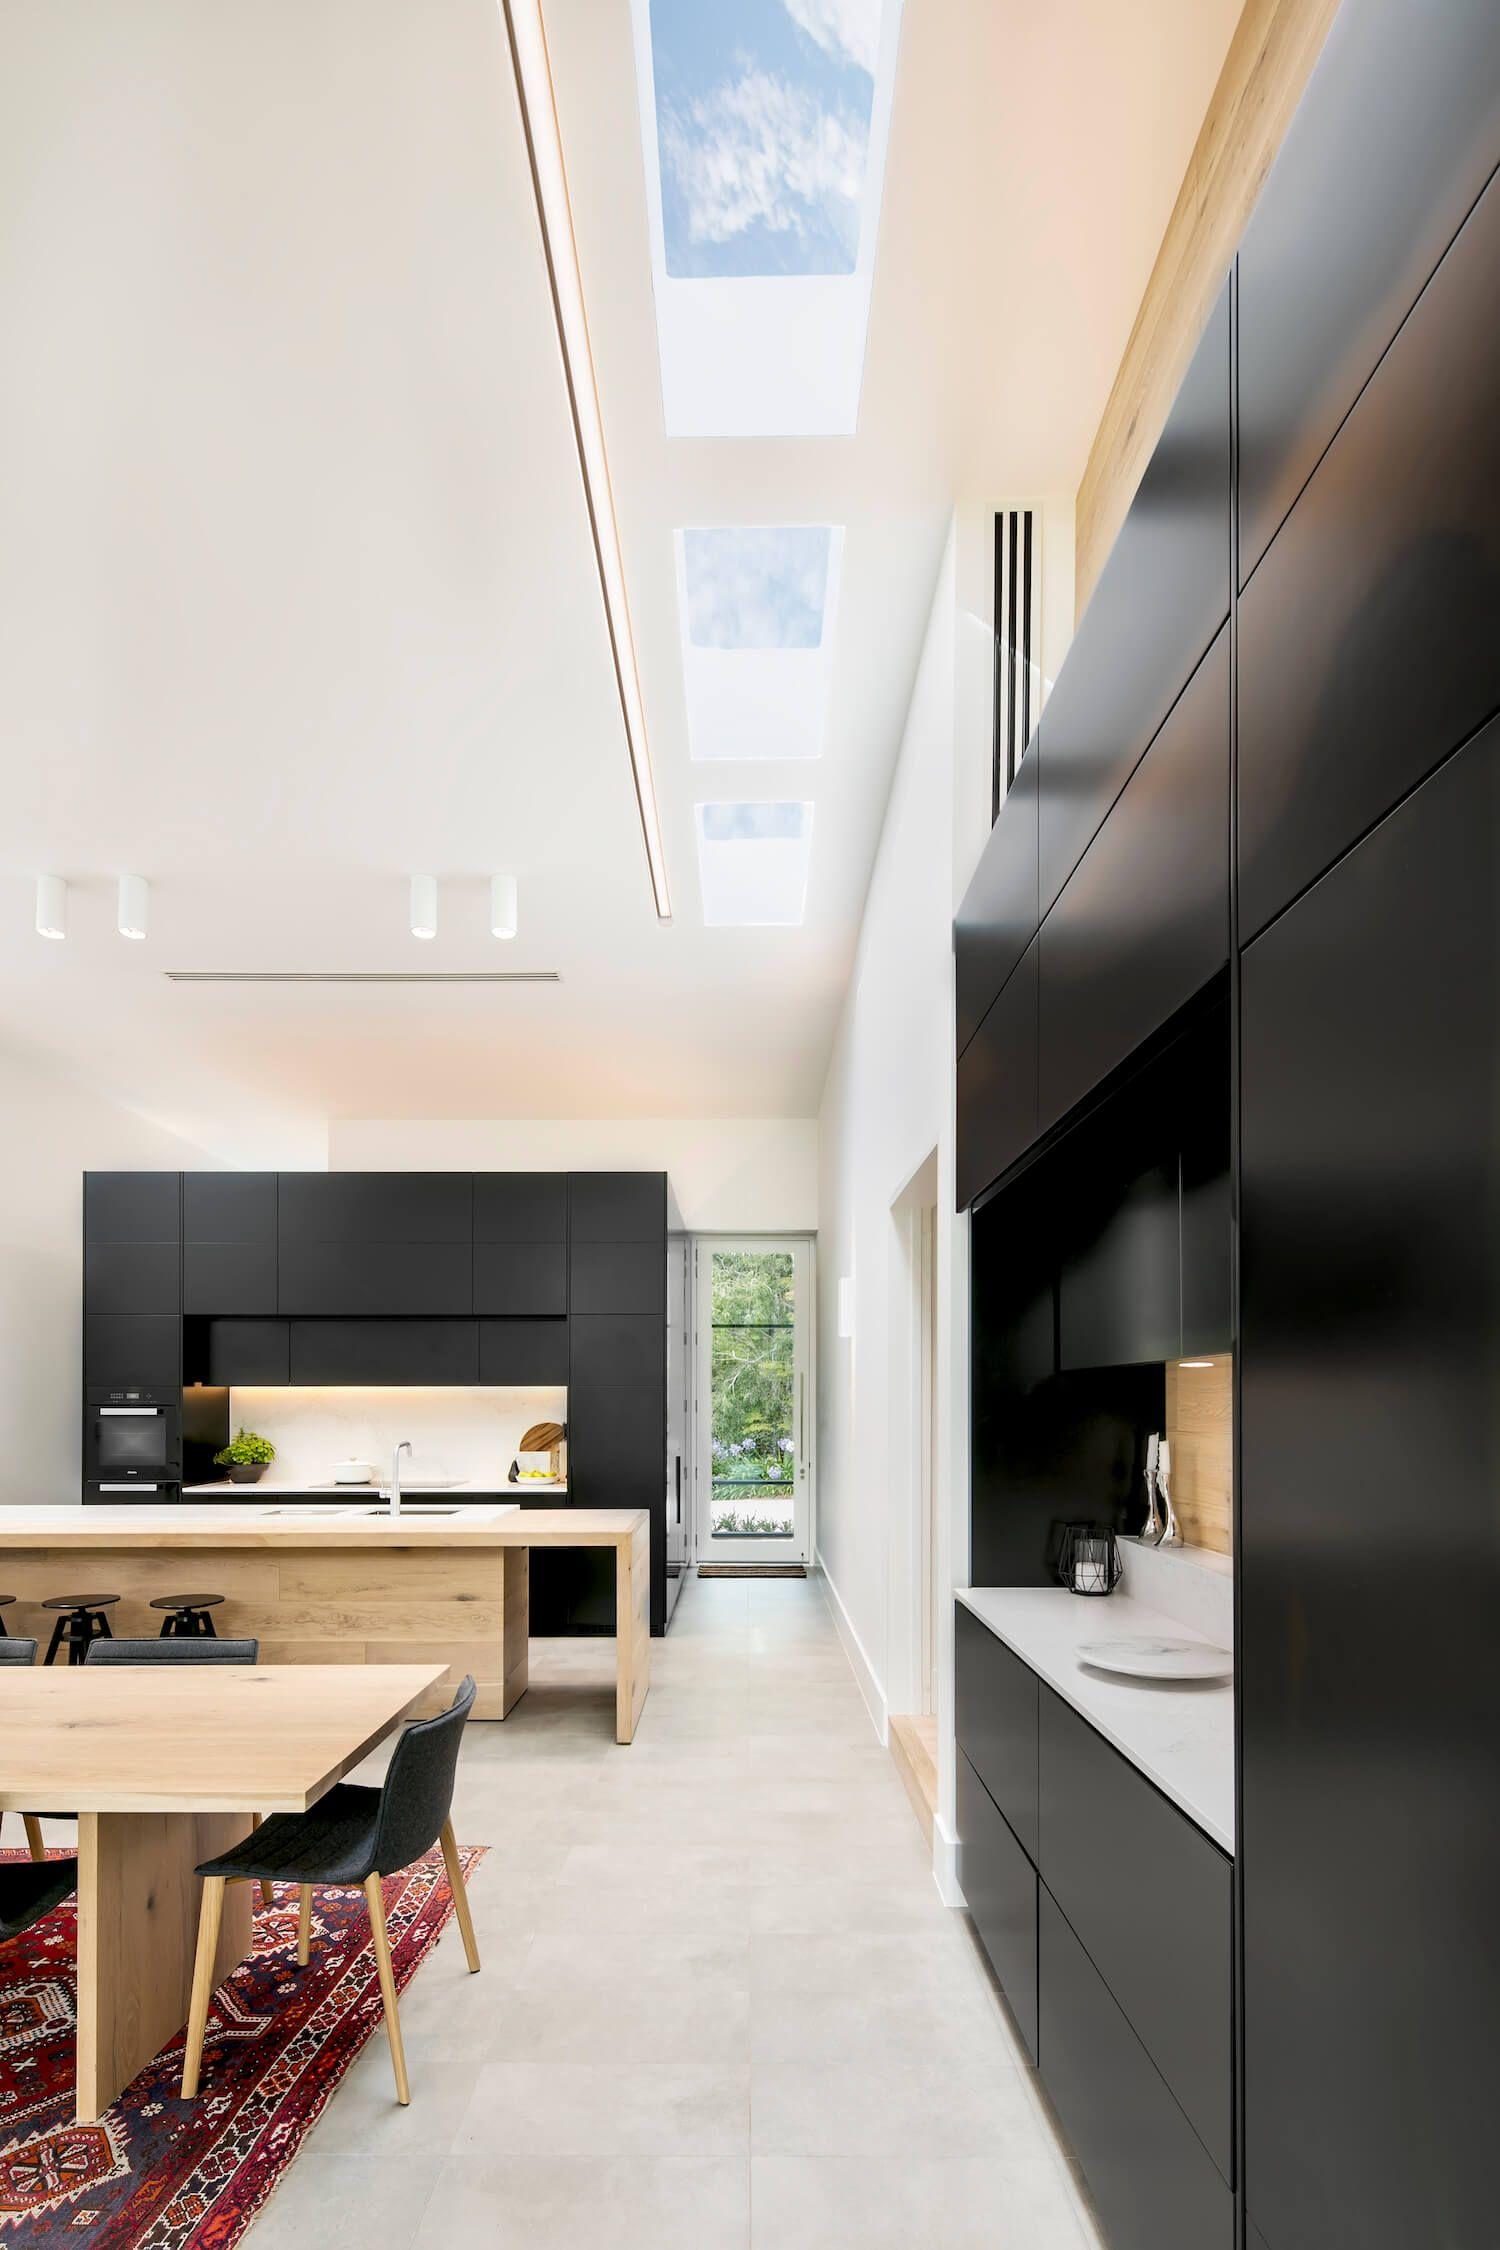 Adelaide Hills Home by Black Rabbit   Kitchens   Pinterest   Rabbit ...